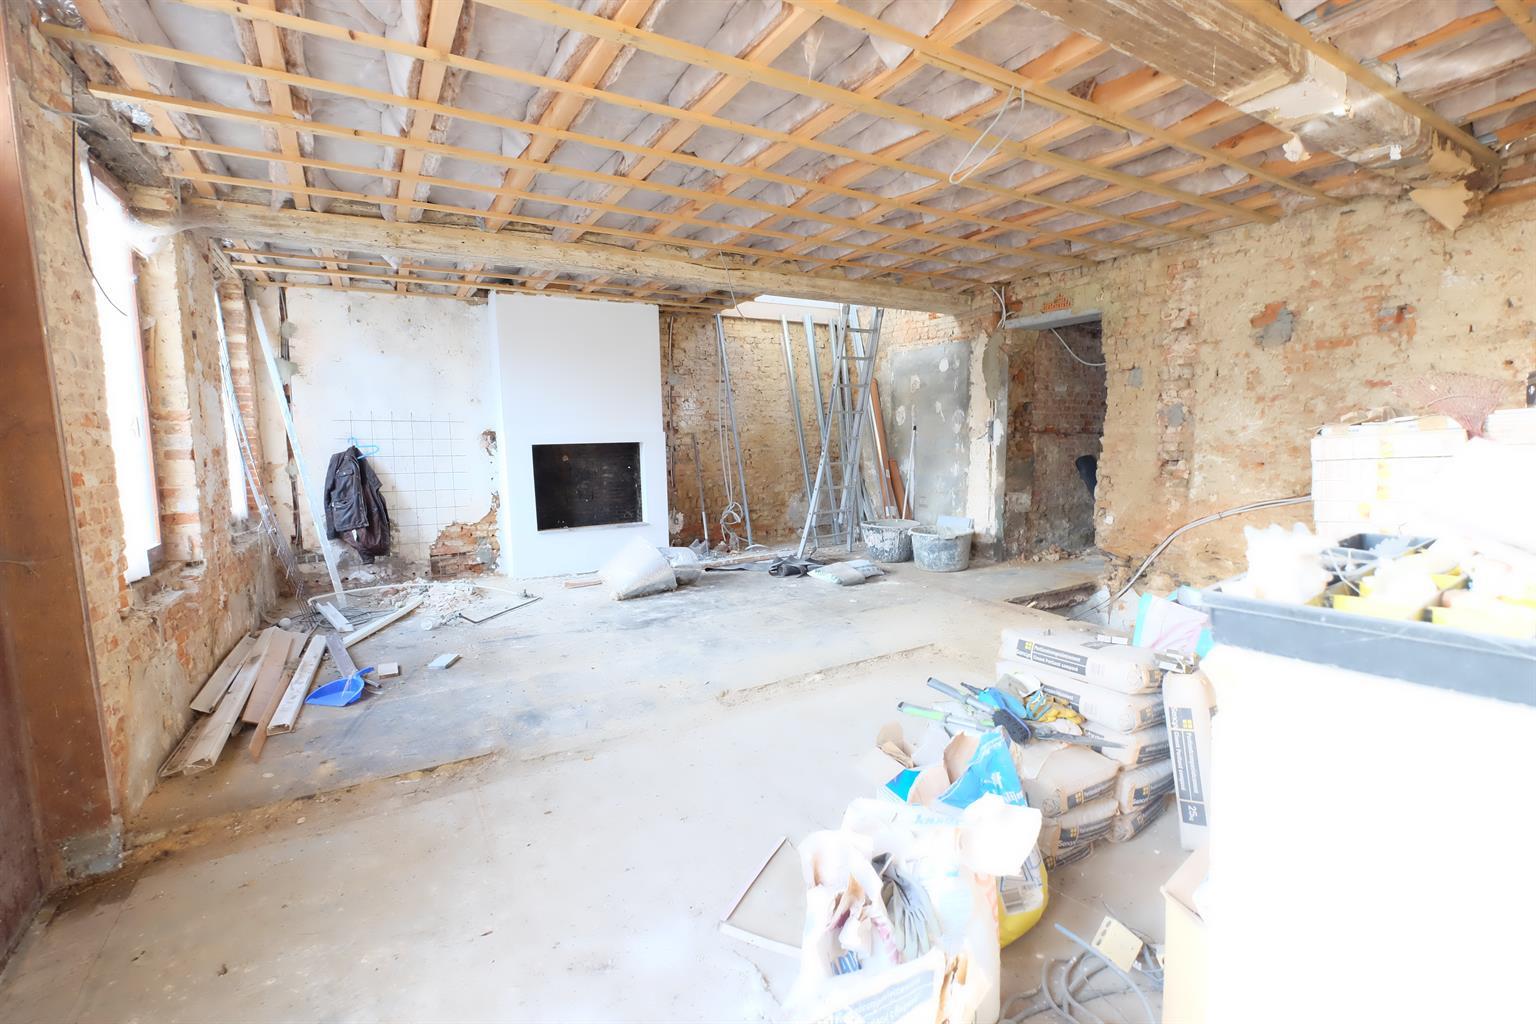 Maison - Tubize Oisquercq - #4252207-3